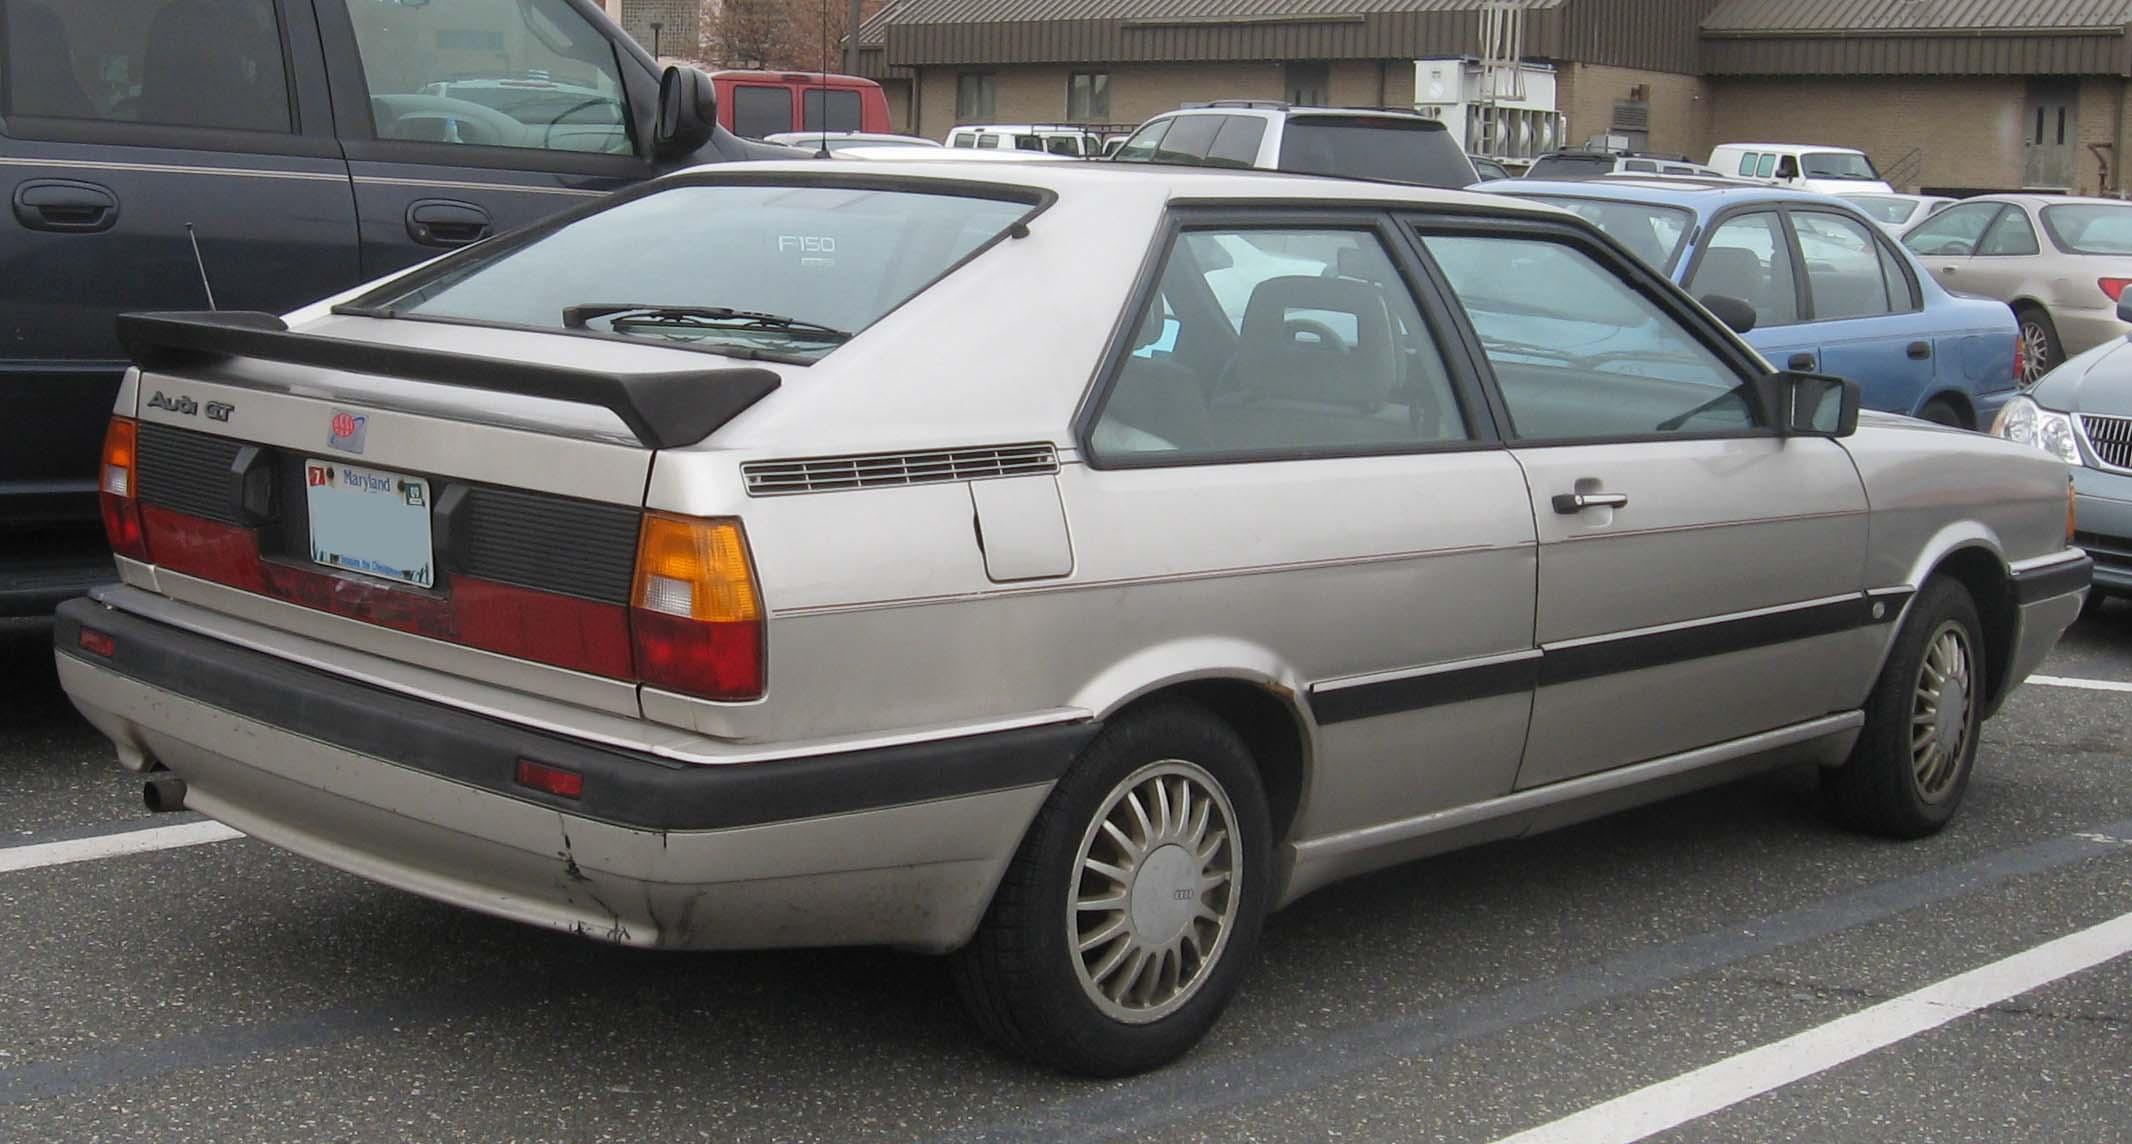 Audi Com Usa >> File:Audi-GT-rear.jpg - Wikimedia Commons